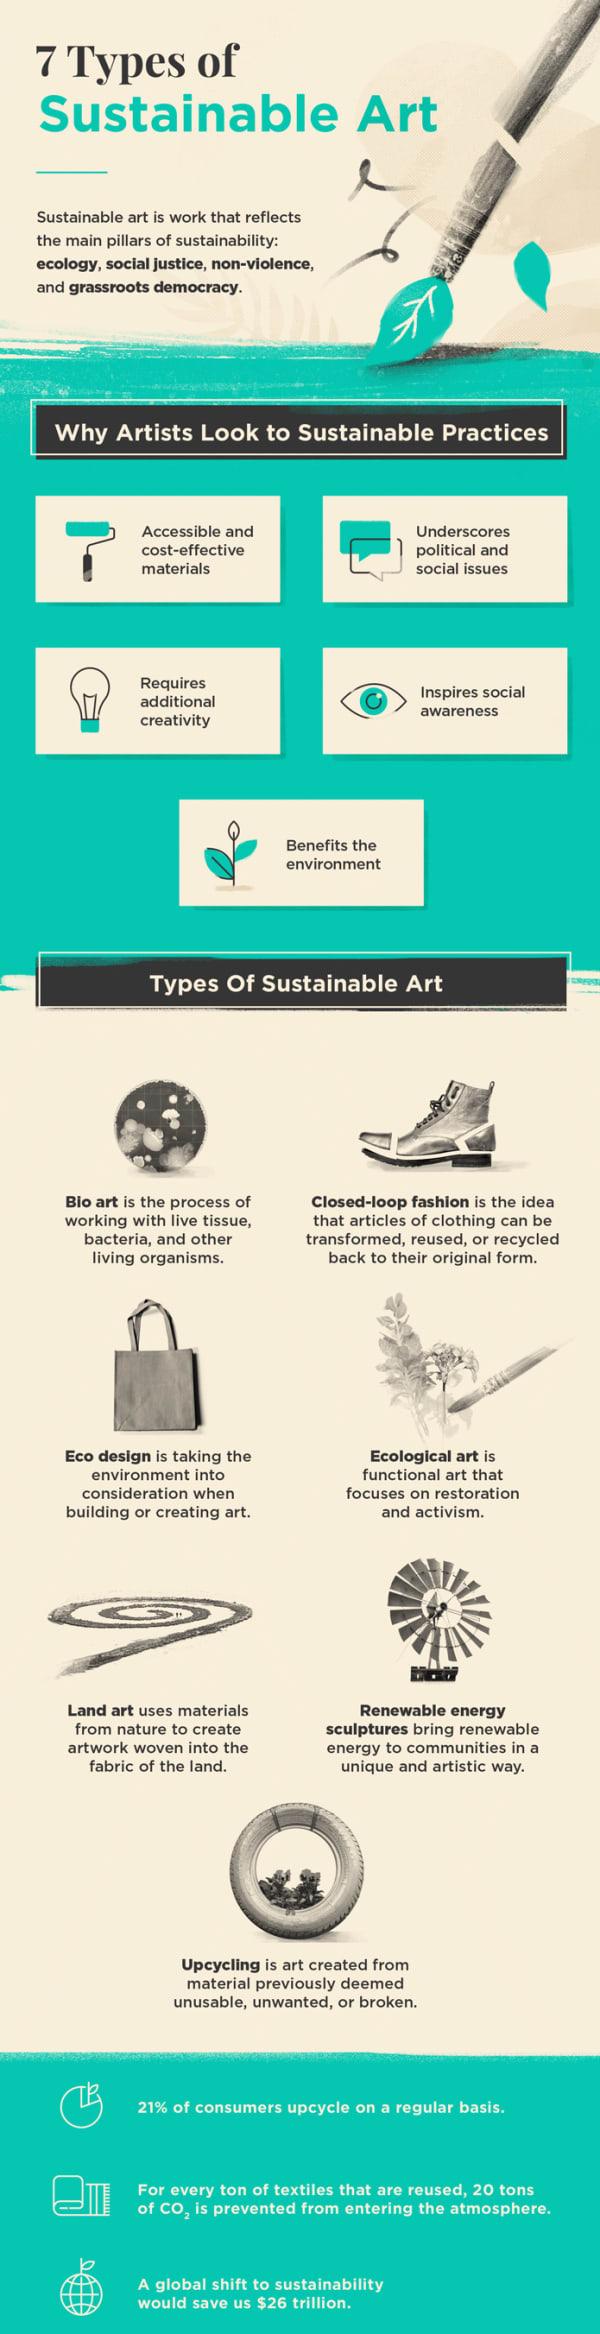 Sustainable art infographic.